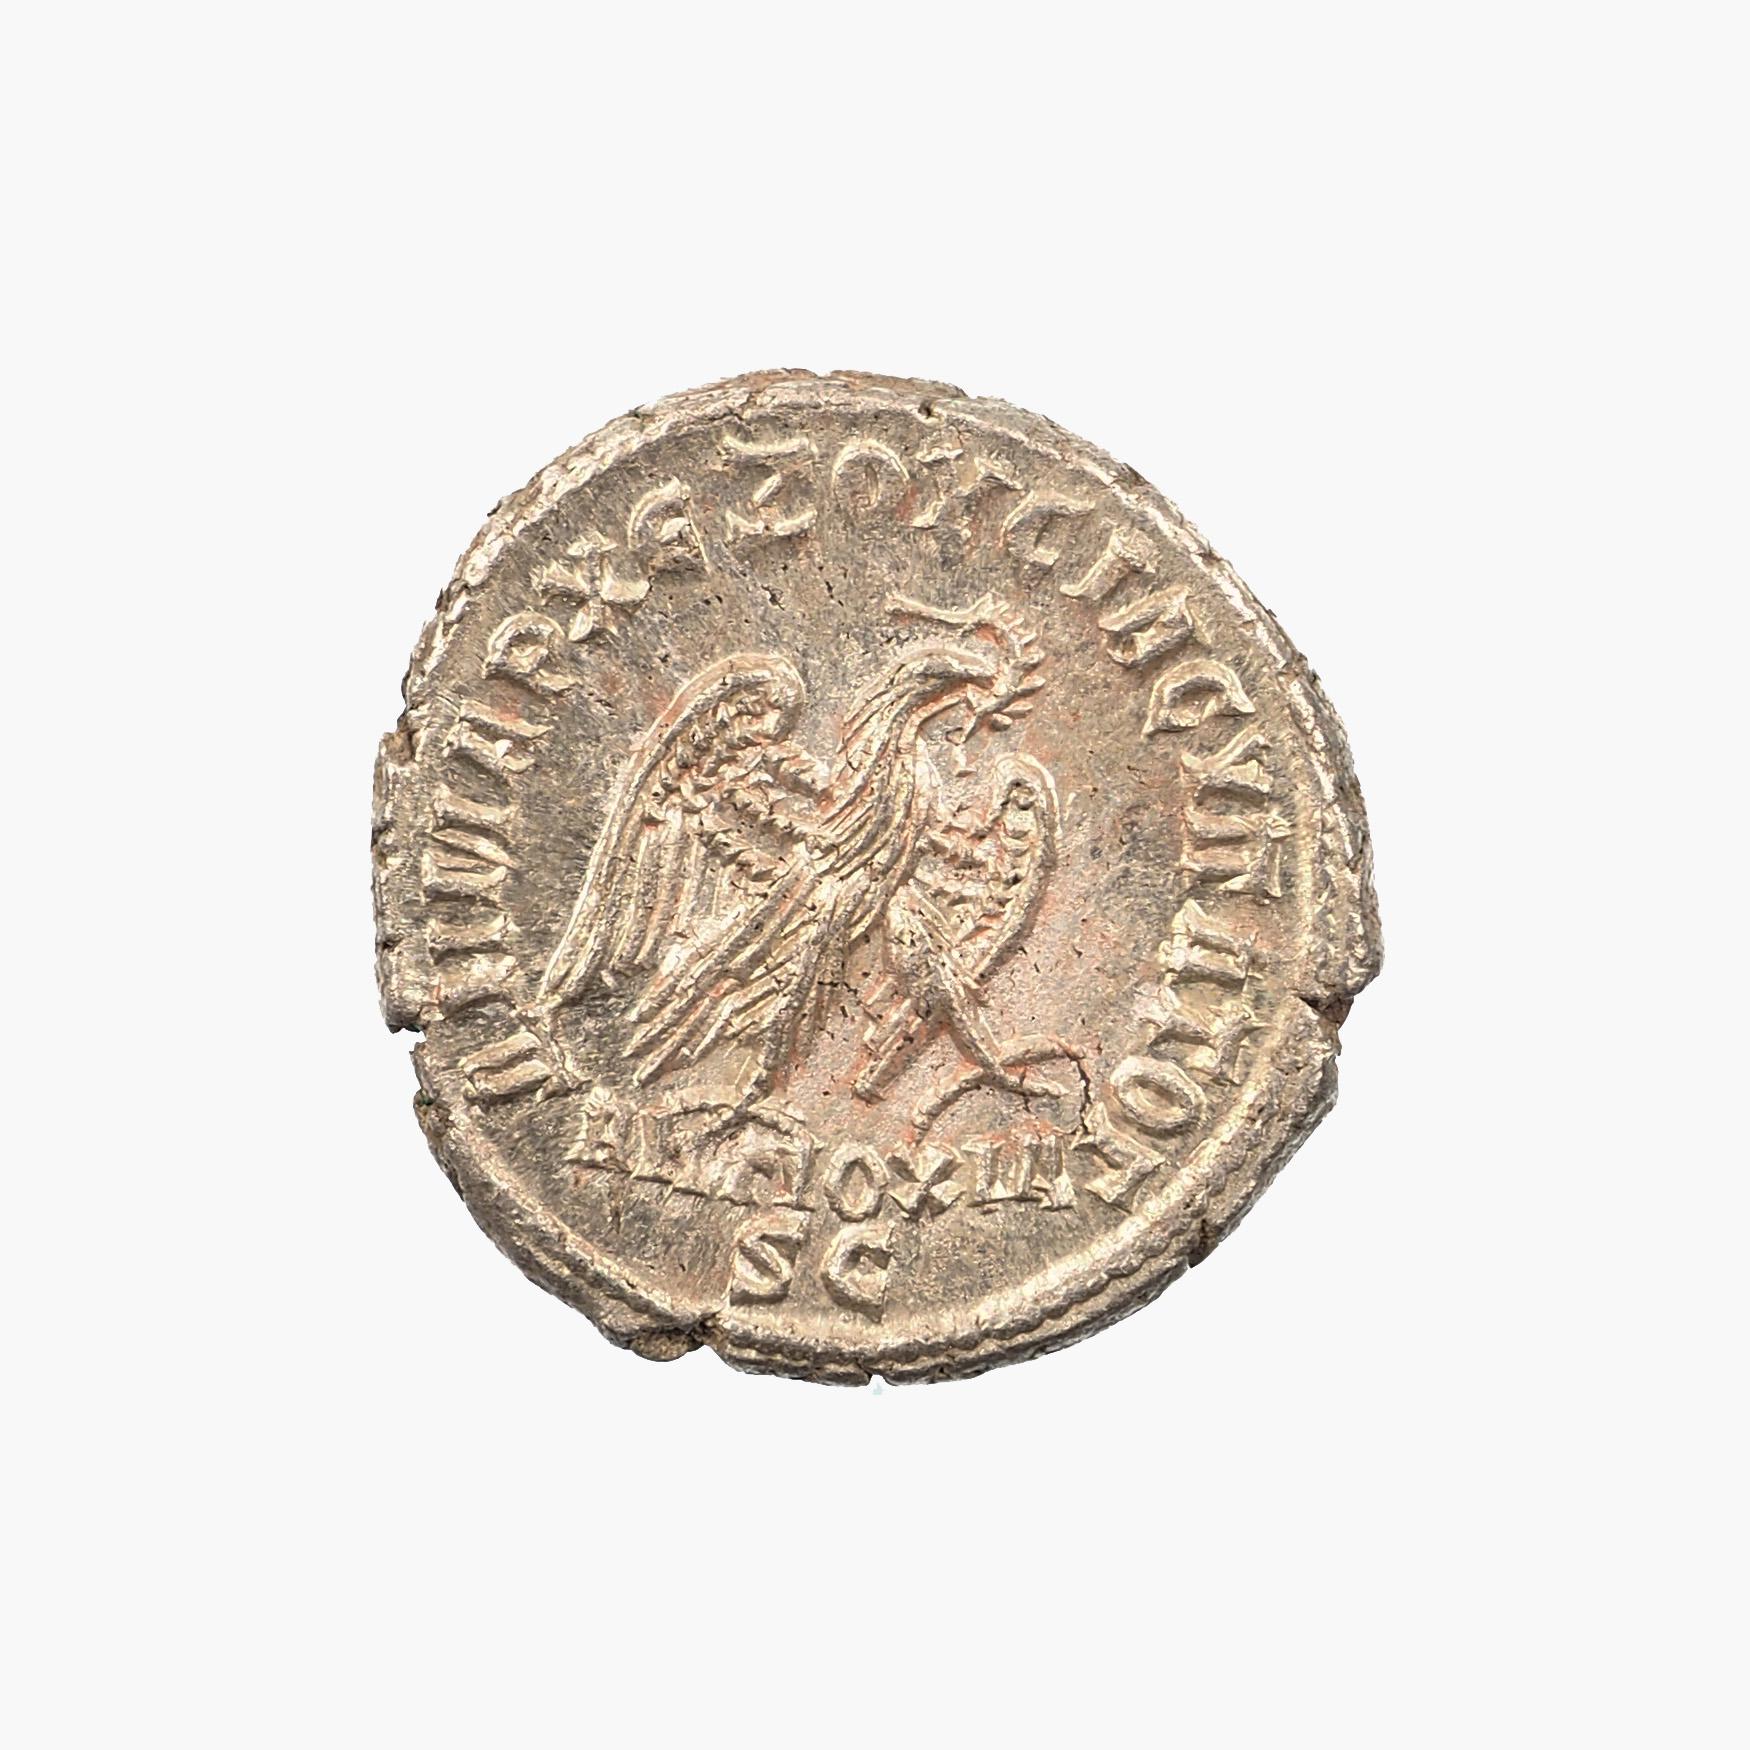 Philippe l'Arabe (244-249), Tétradrachme, 248, Antioche. Prieur 354, SUP+/SPL